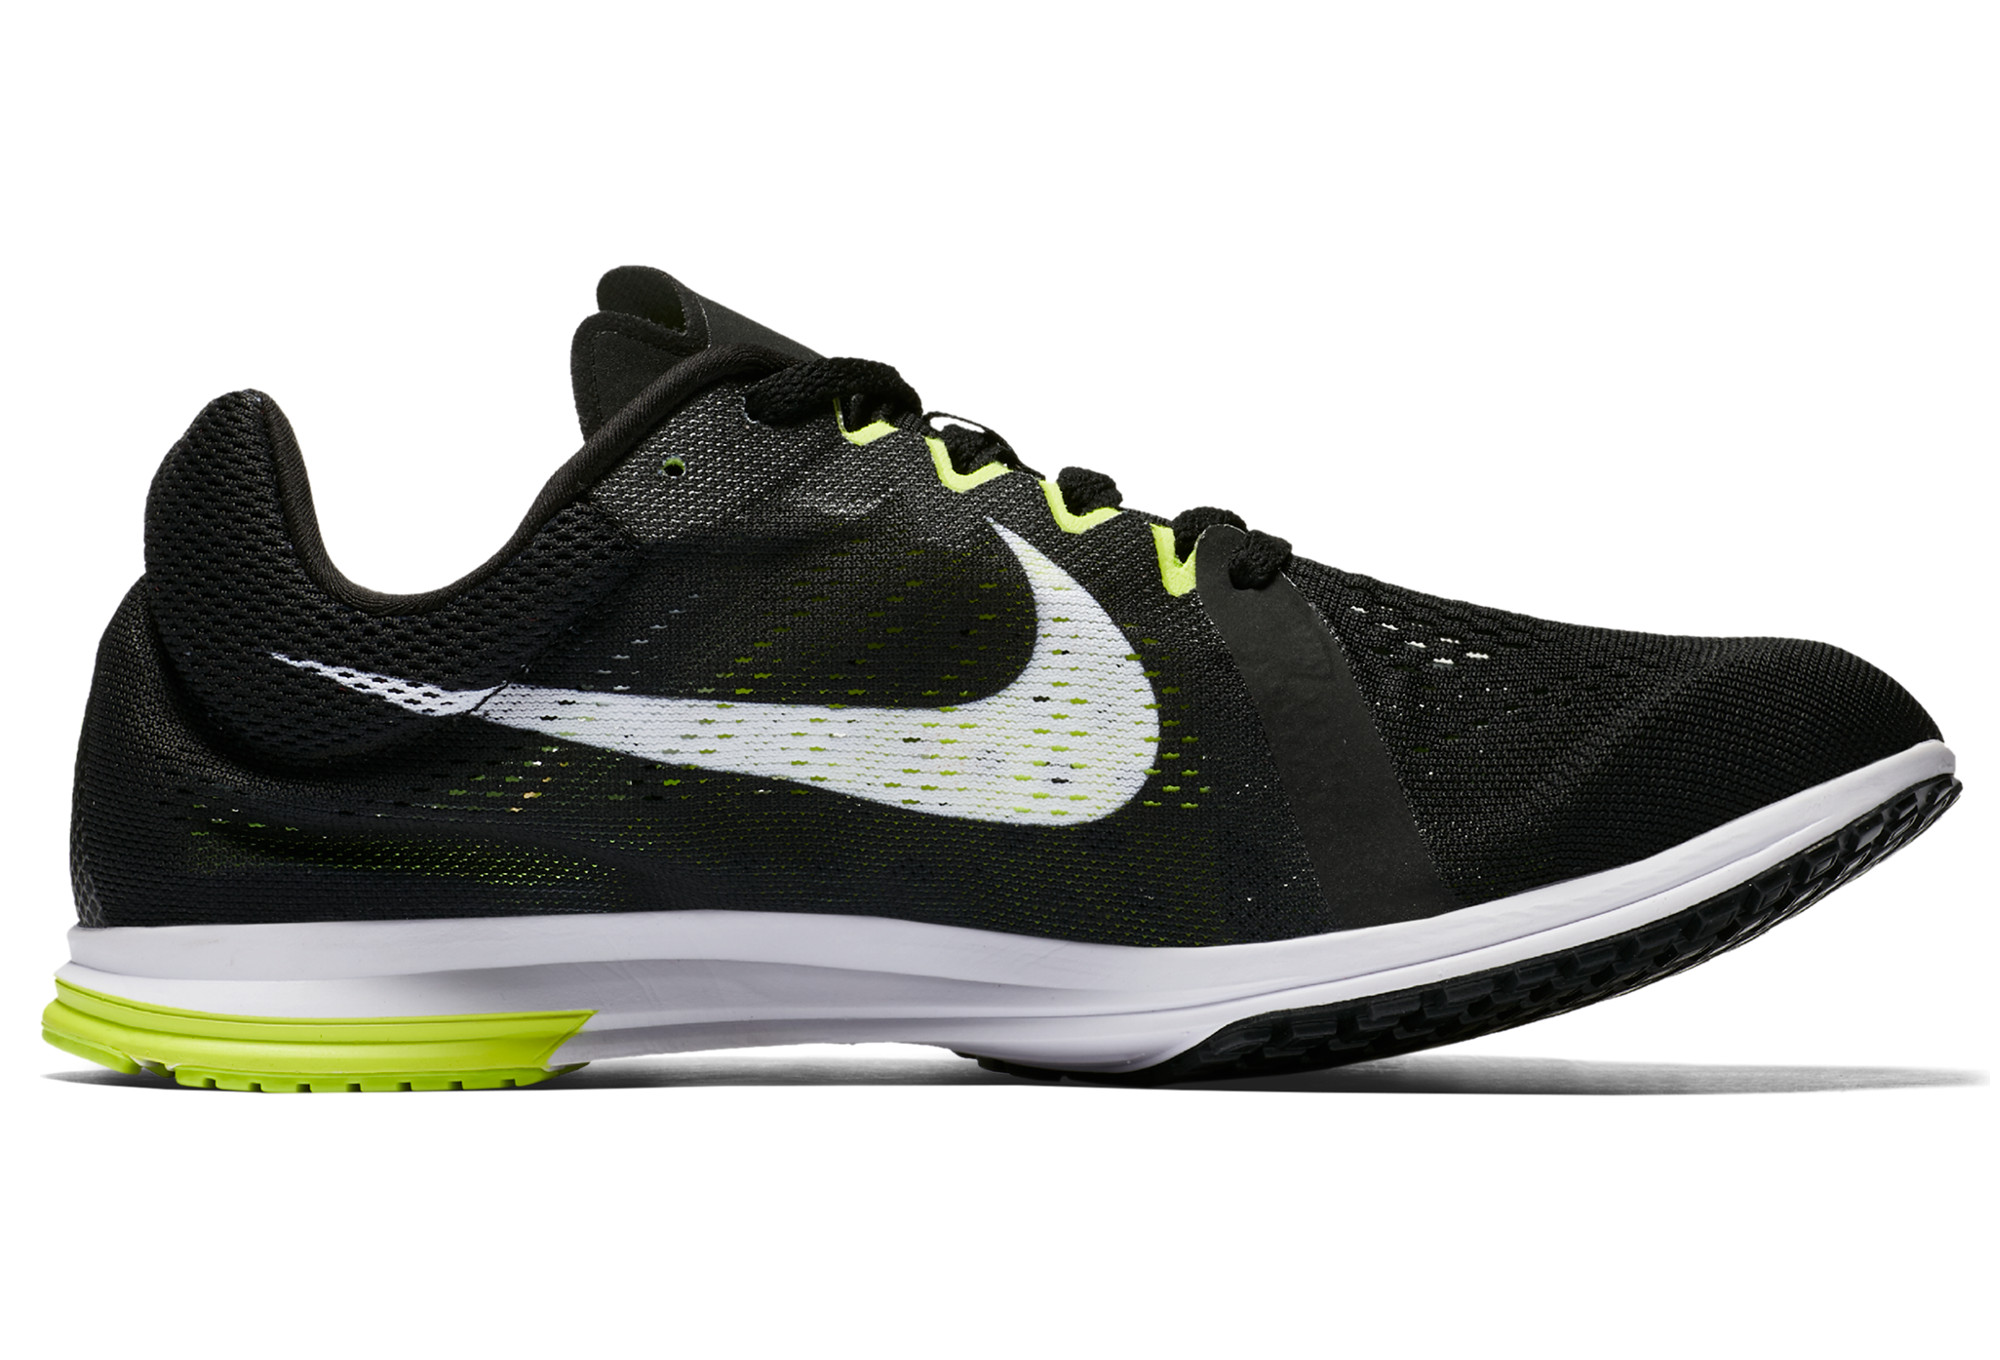 Nike Zoom Streak LT 3 Negro Blanco Amarillo Unisex